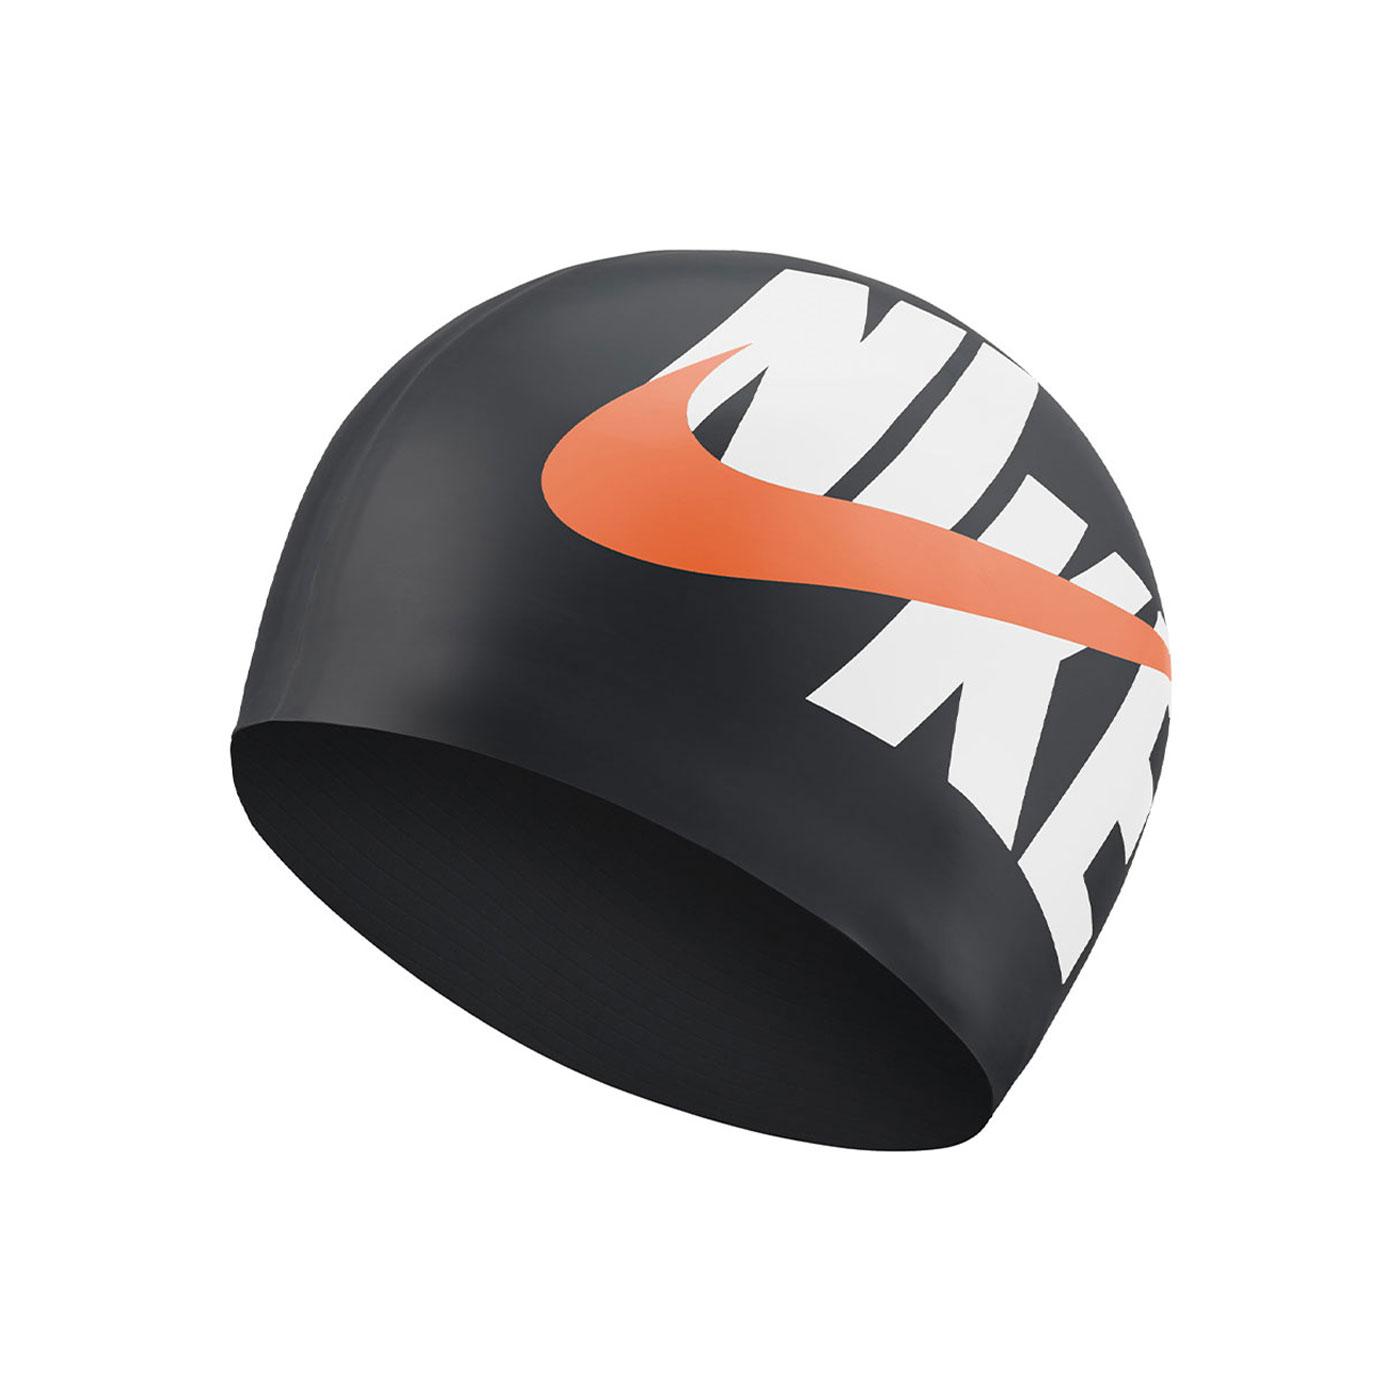 NIKE SWIM 成人矽膠泳帽 NESSA203-001 - 黑白橘